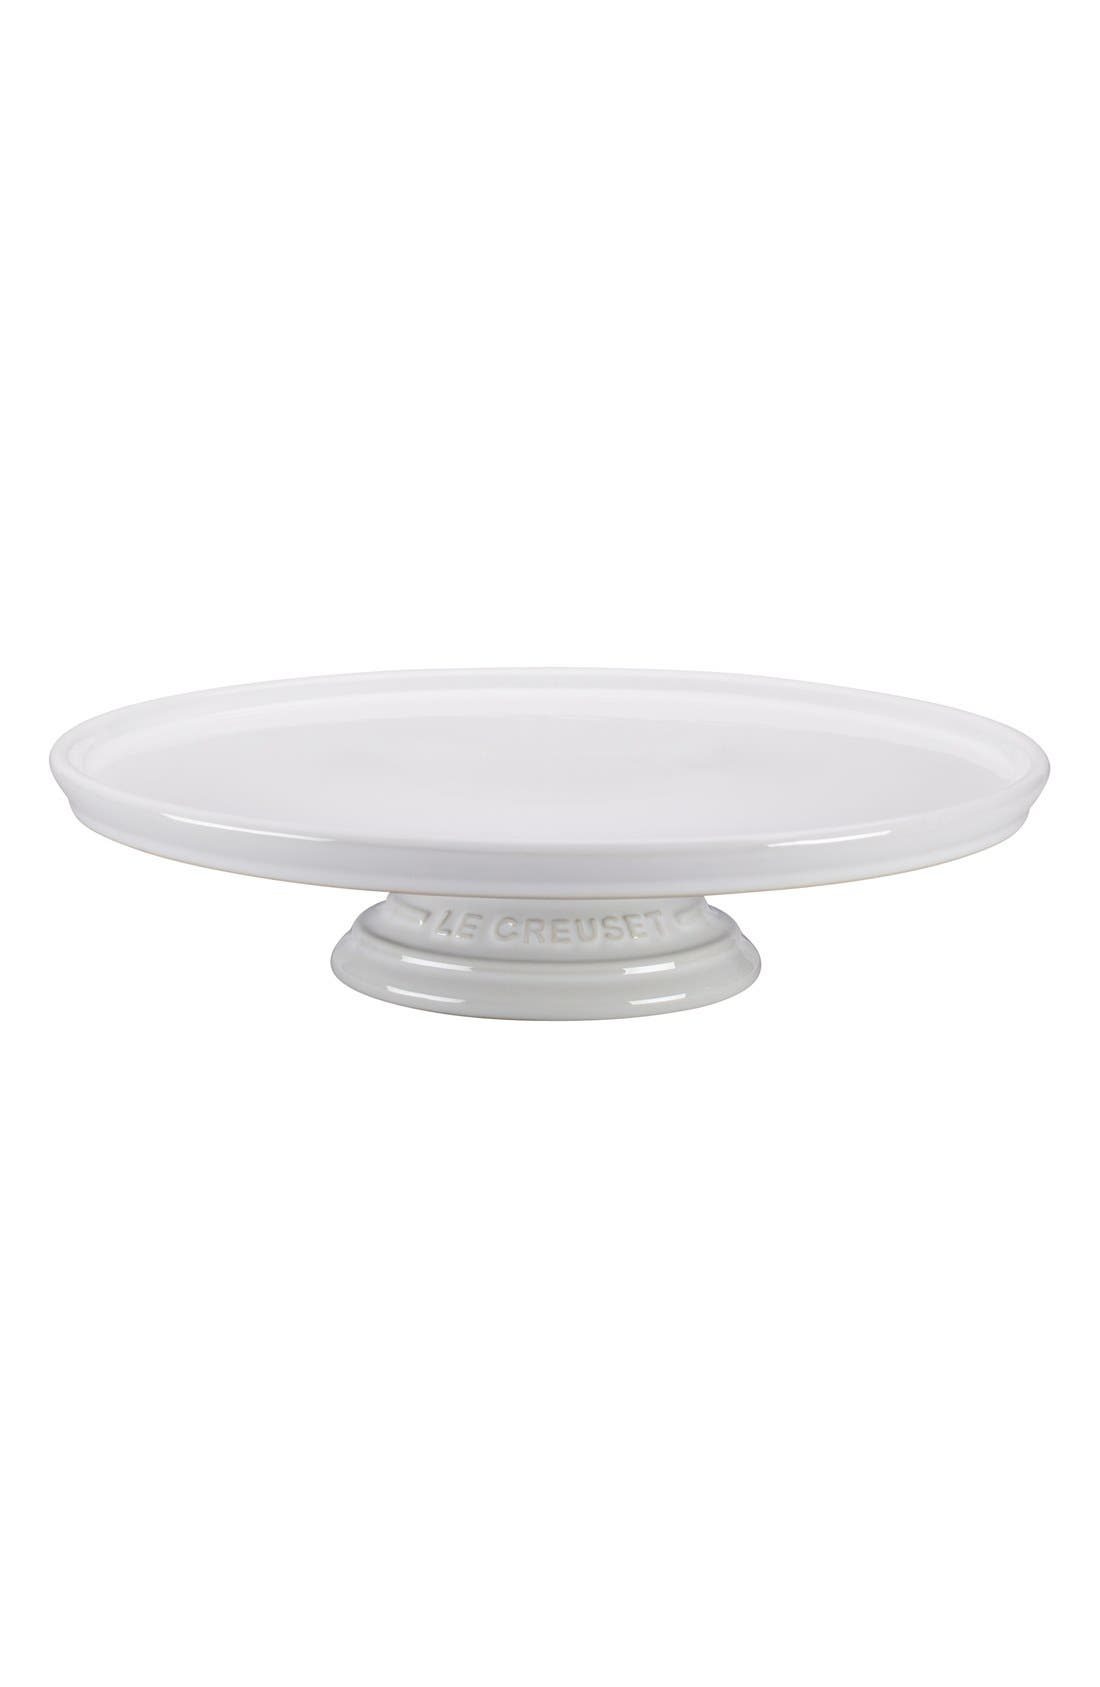 Stoneware Cake Stand,                             Main thumbnail 1, color,                             WHITE